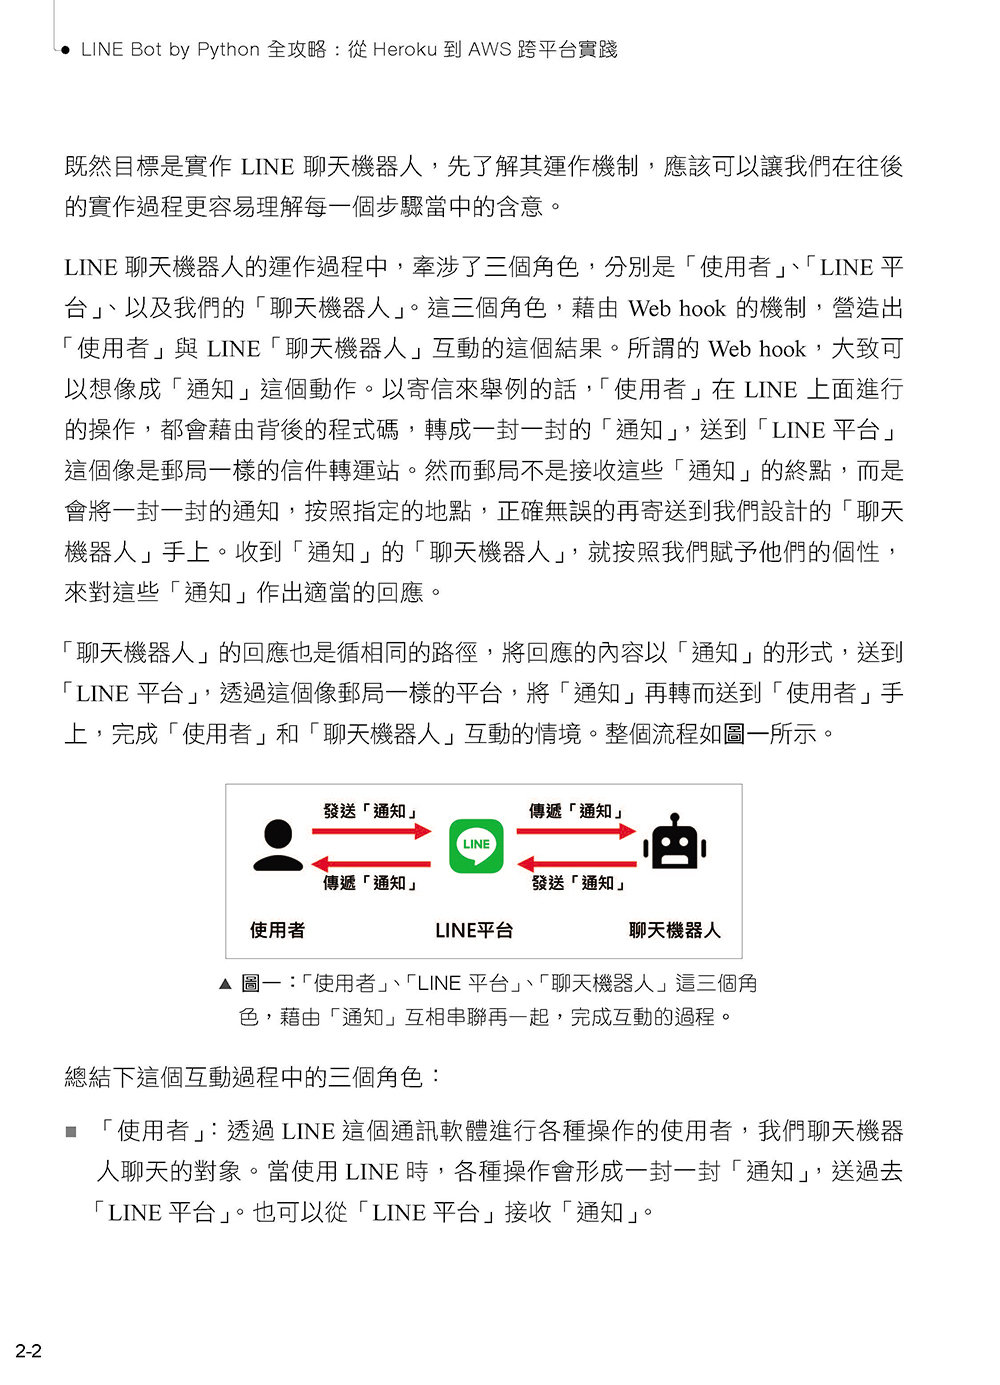 LINE Bot by Python 全攻略:從 Heroku 到 AWS 跨平台實踐 (iT邦幫忙鐵人賽系列書)-preview-2